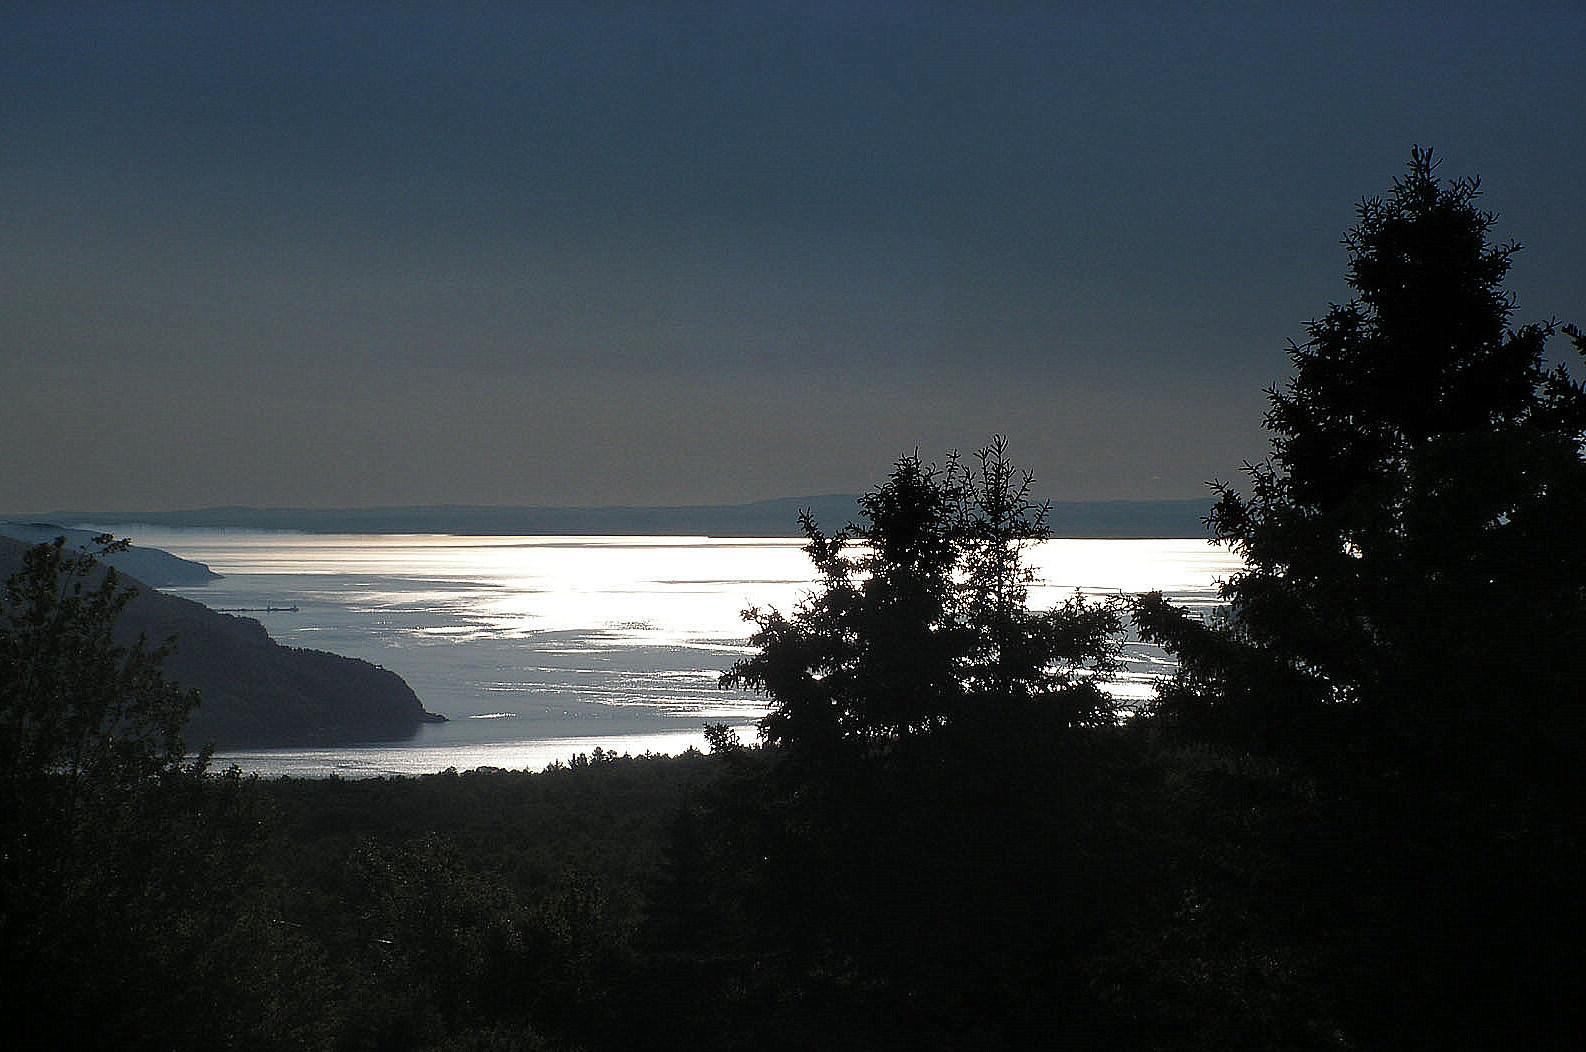 Silver Water at Sunrise by JocelyneR